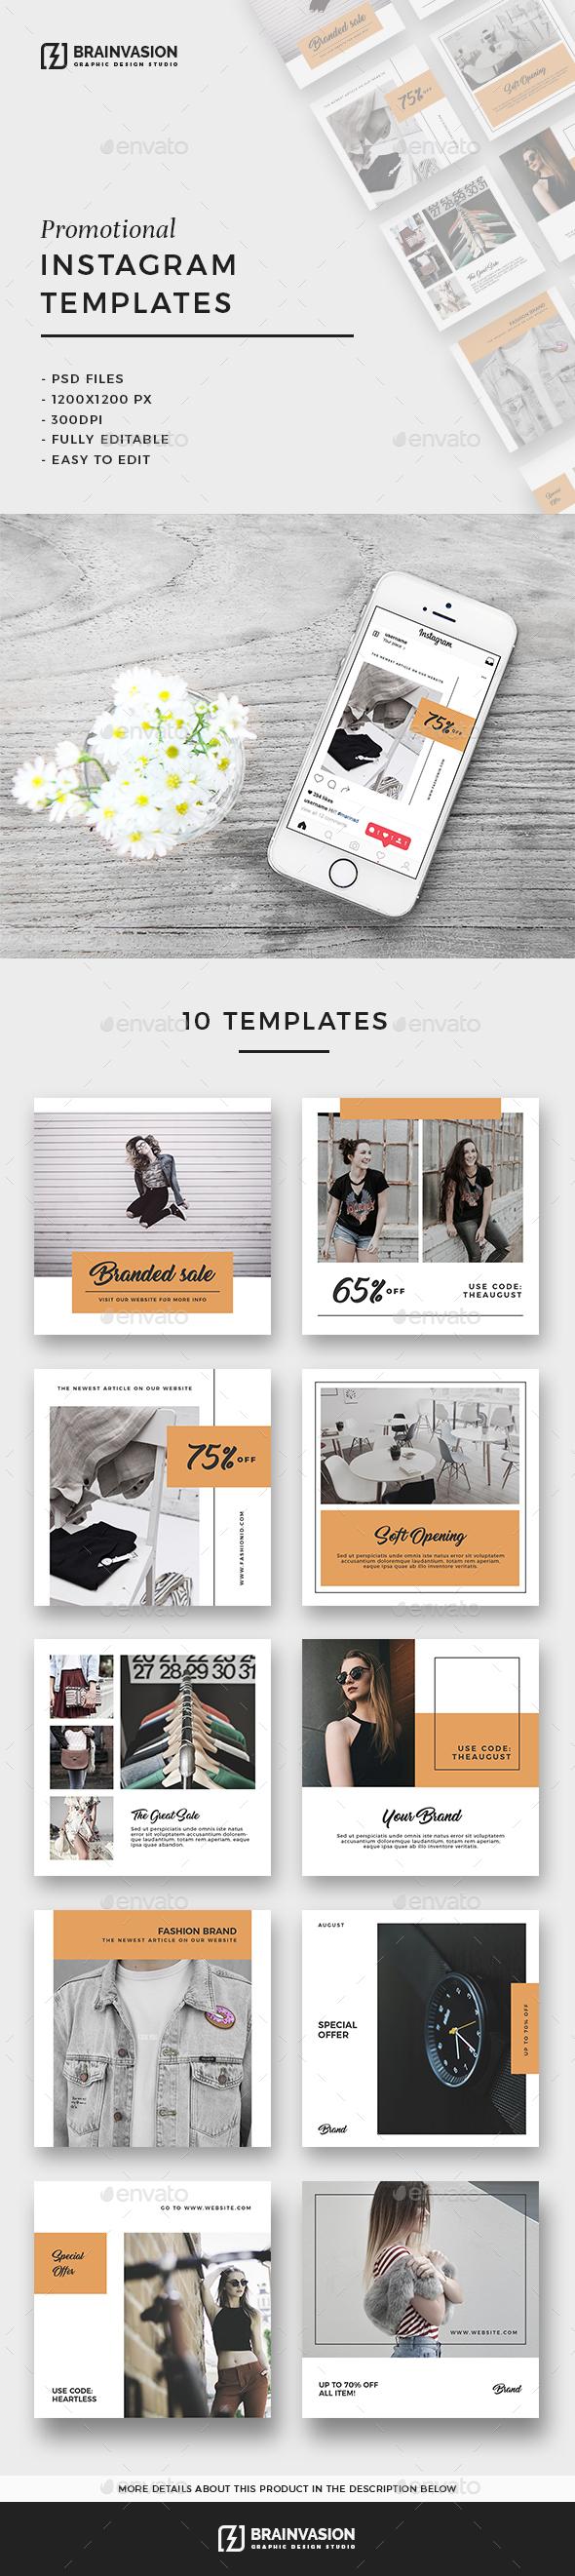 GraphicRiver Instagram Templates Vol.04 20437836